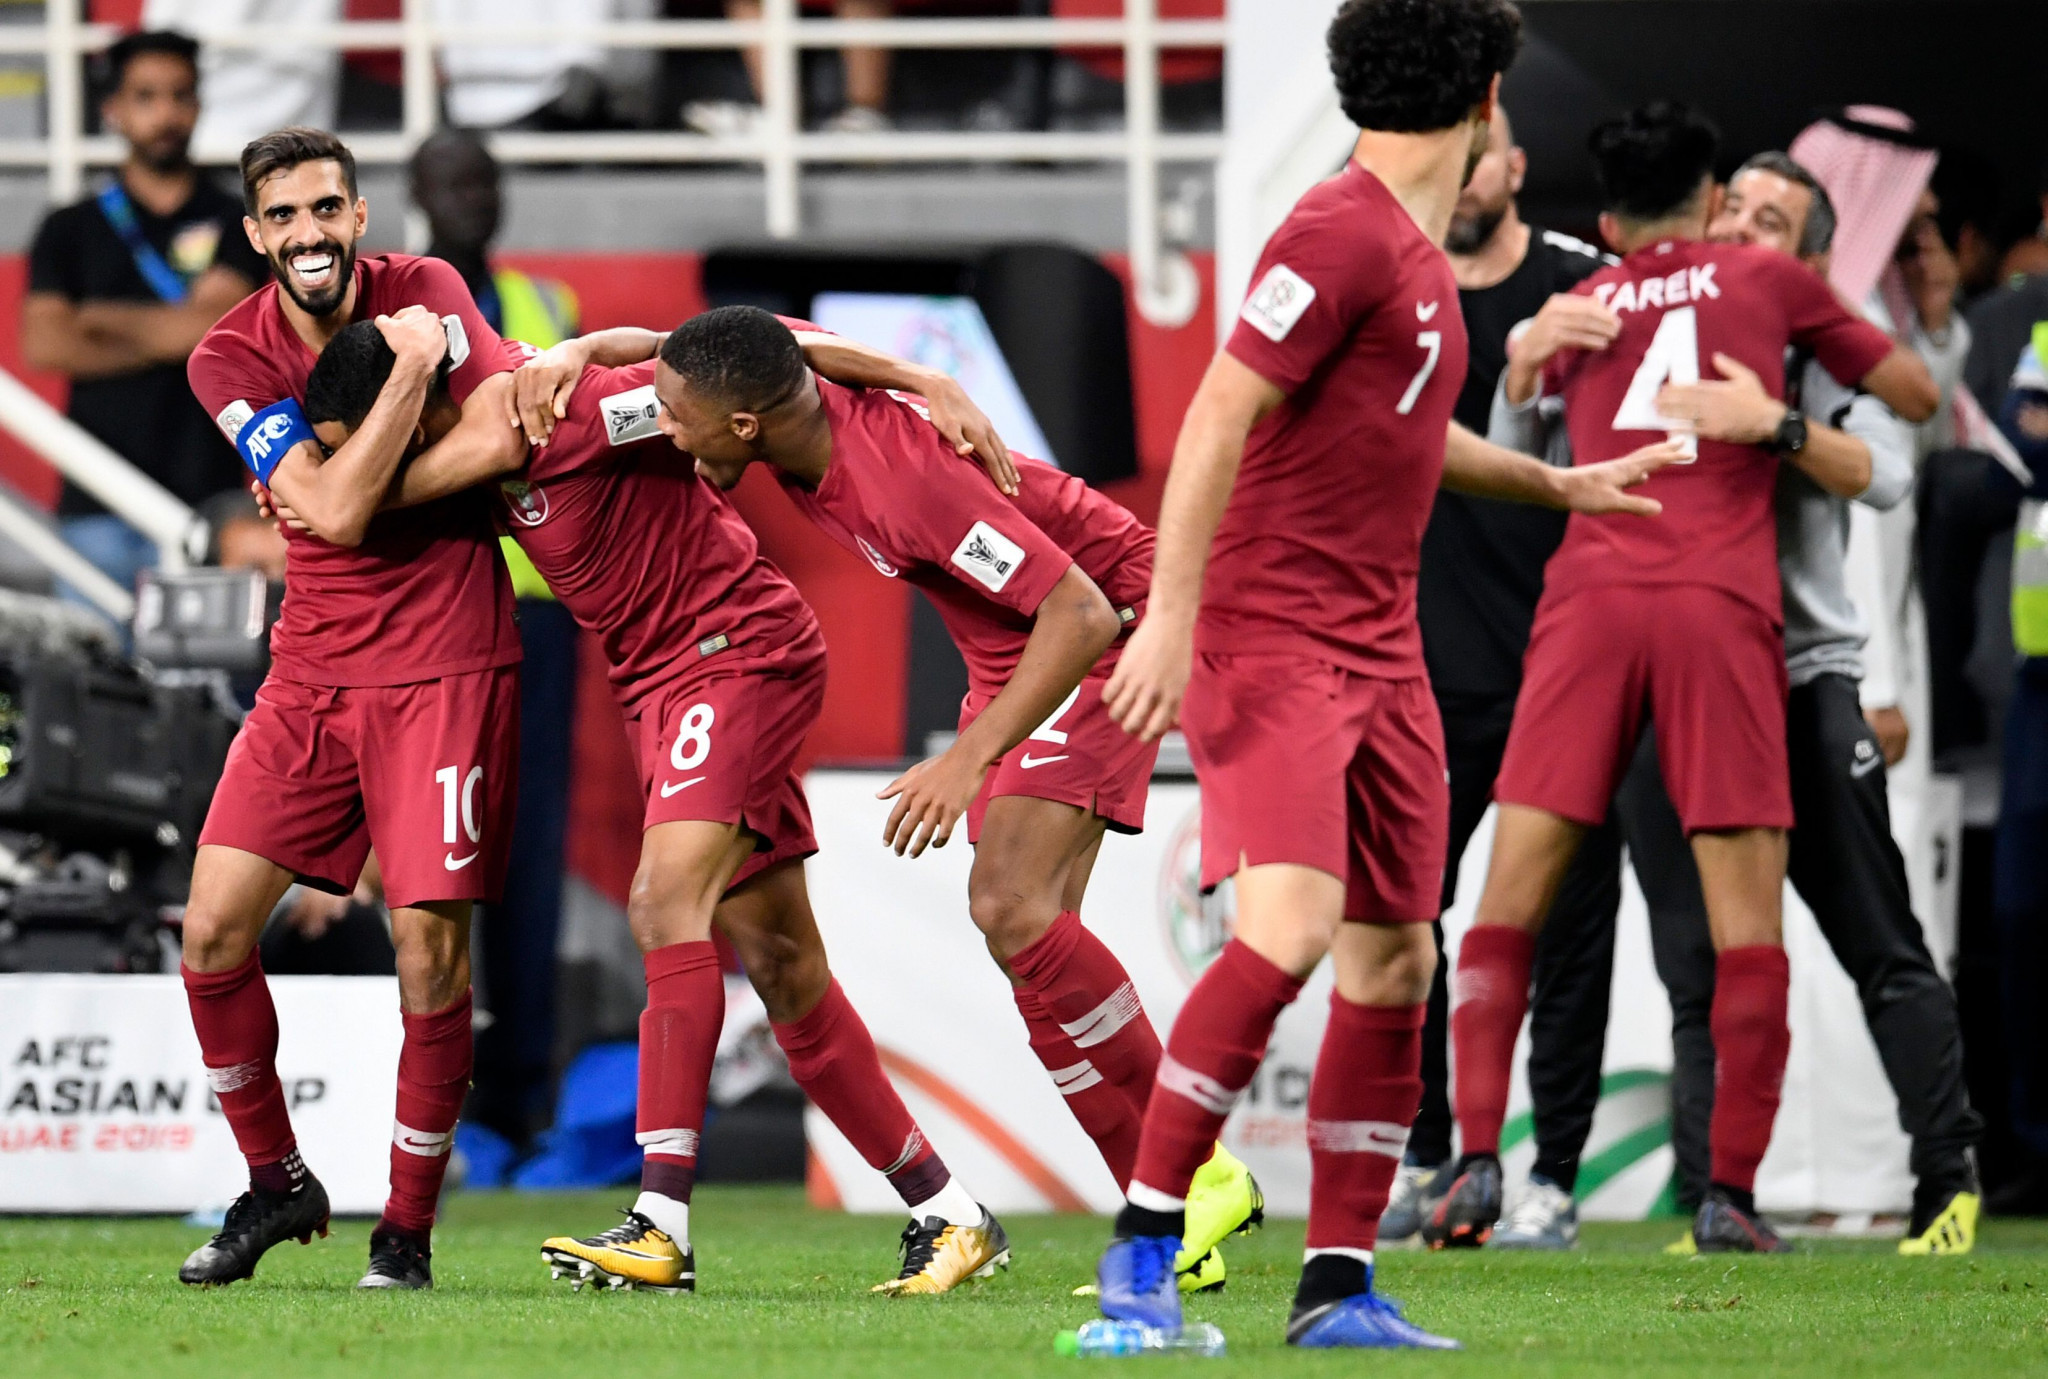 Qatar reach AFC Asian Cup final after thrashing hosts UAE in bad-tempered last four clash